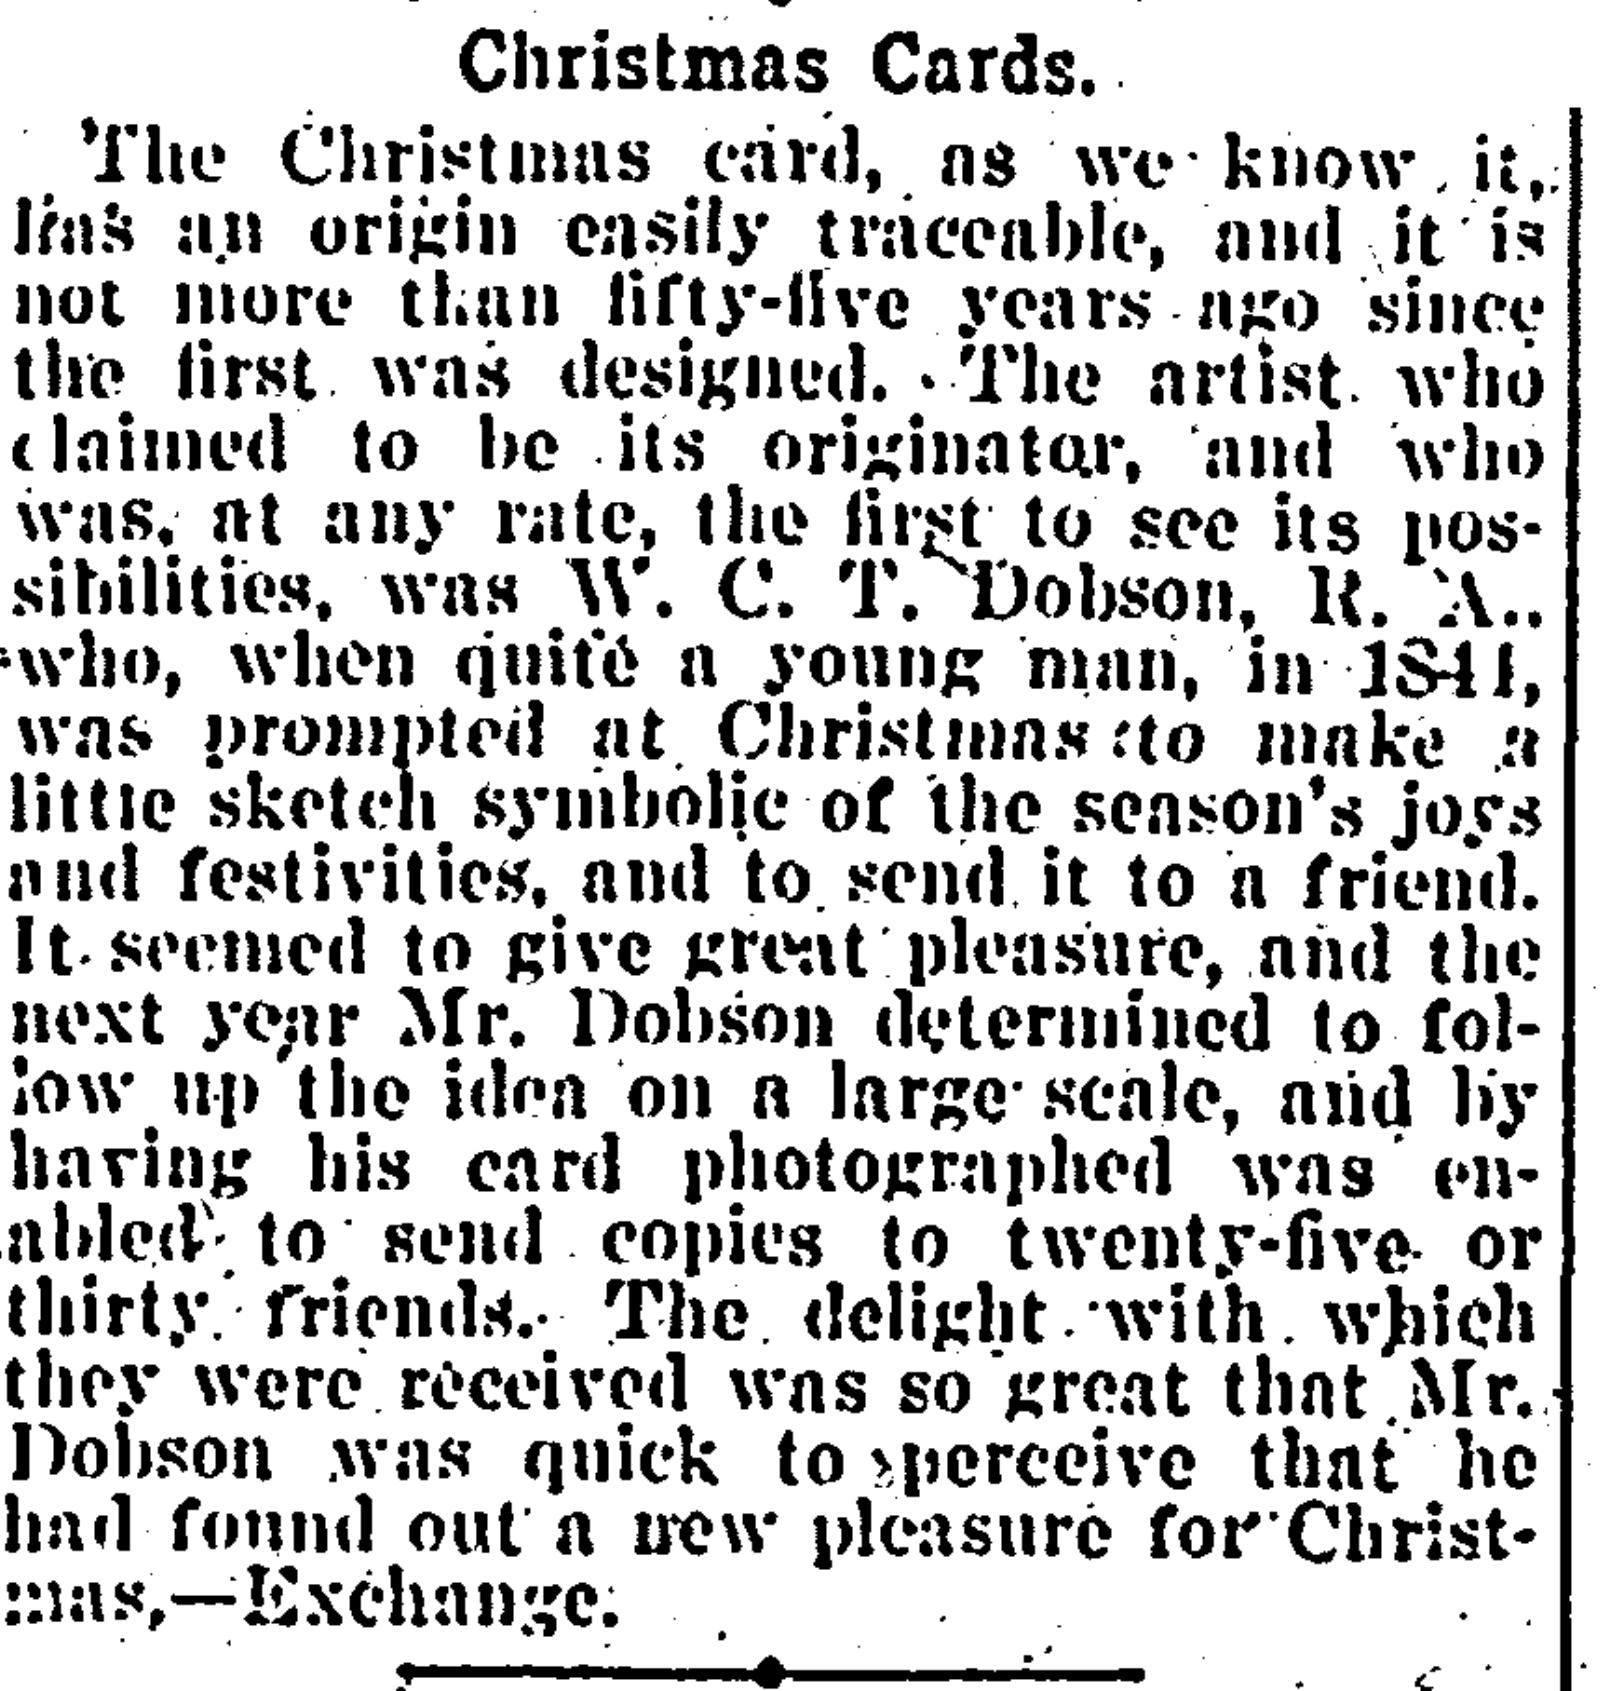 Creator of the Christmas Card